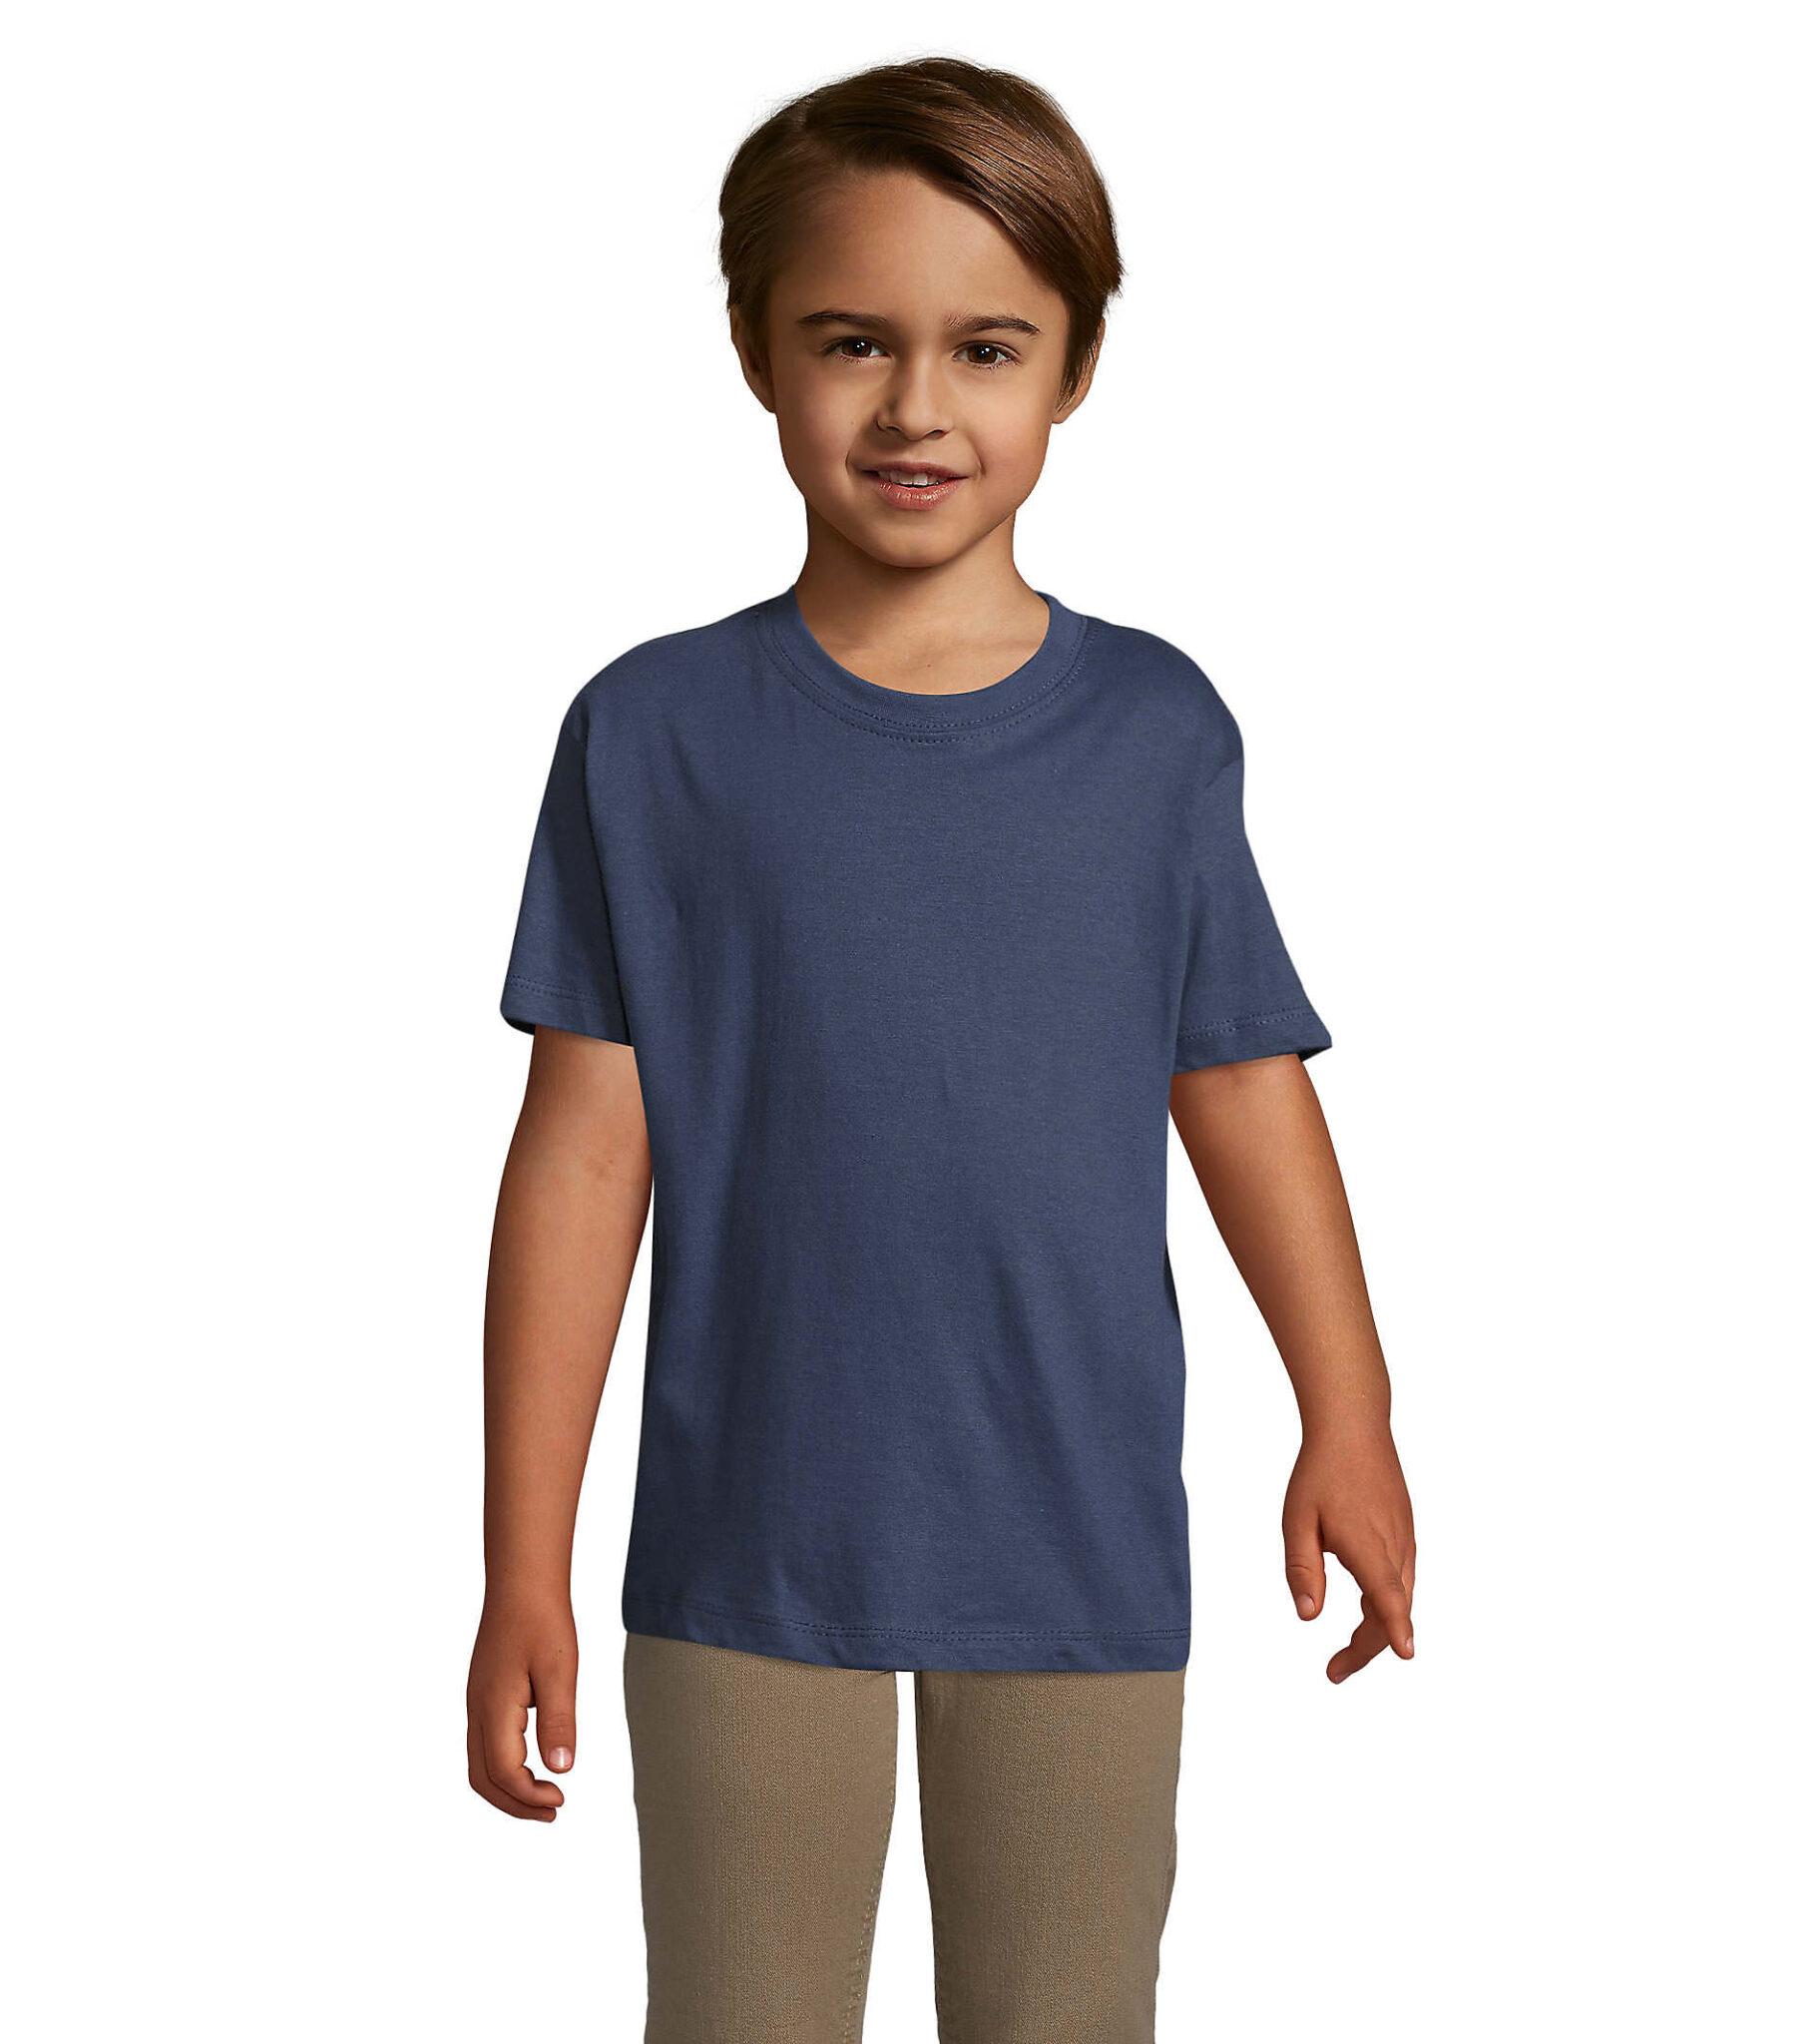 Sol's Παιδικό Μπλουζάκι